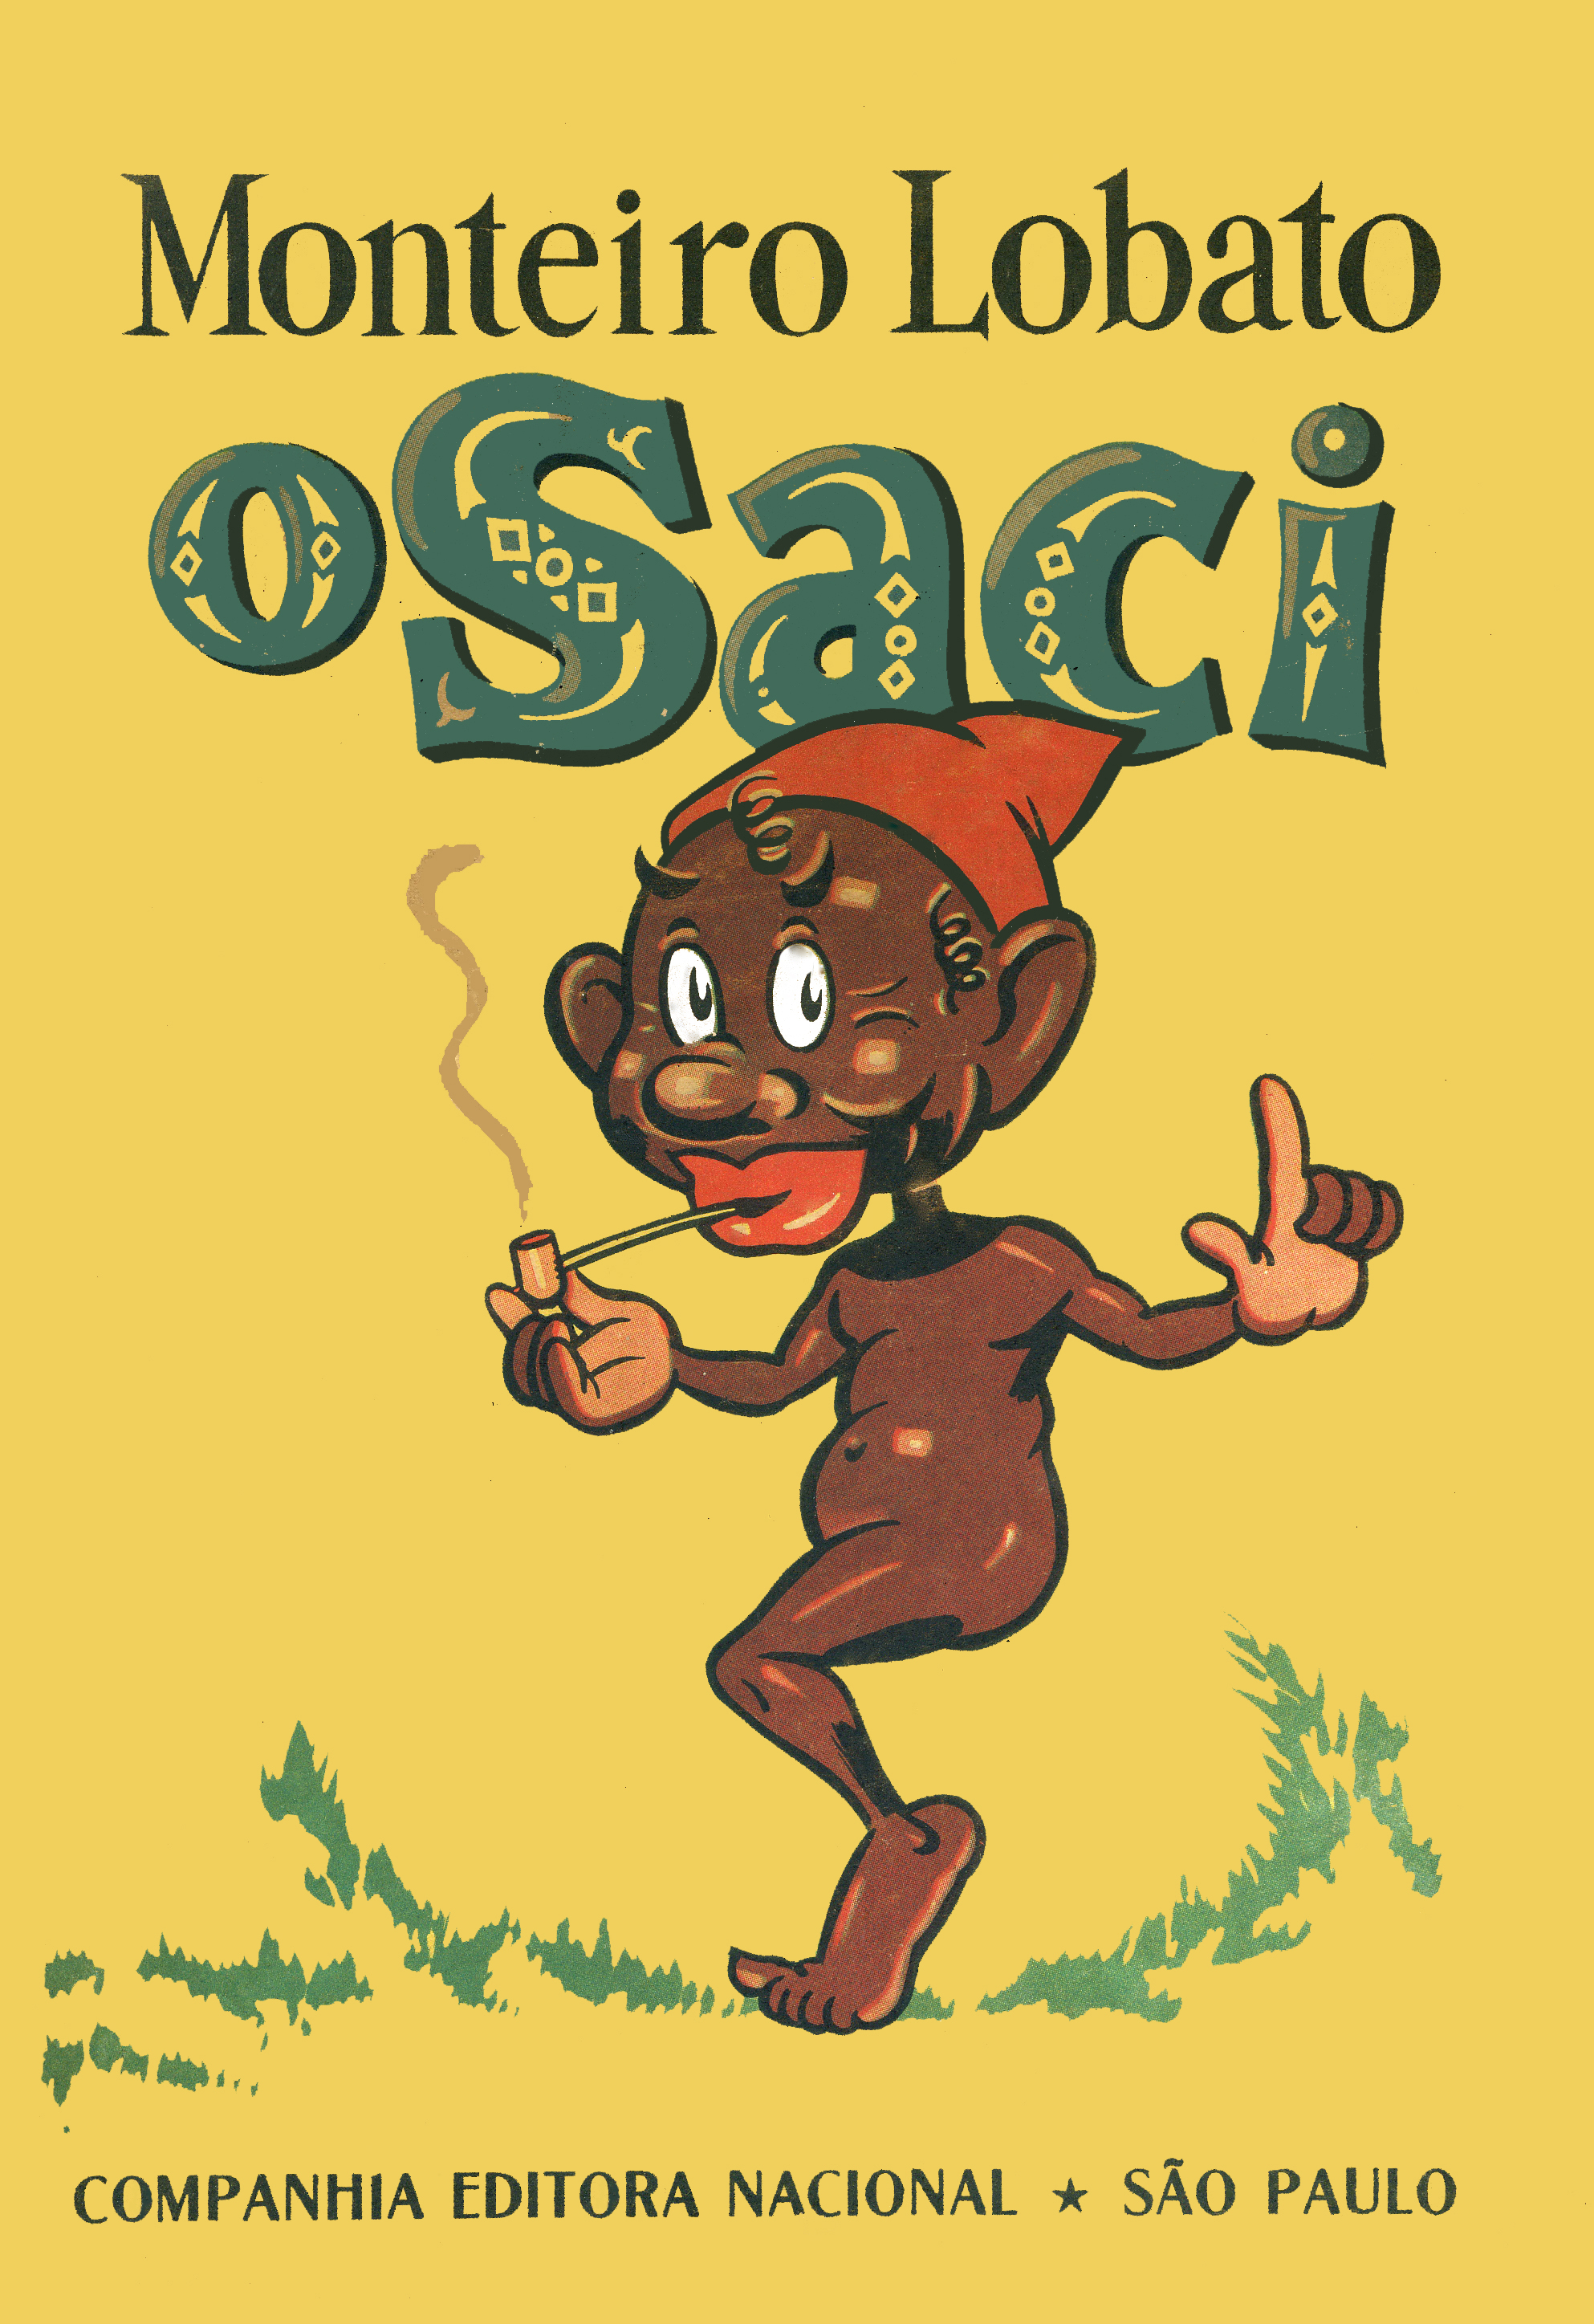 O Saci, capa, 8ª ed., CEN, 1941. Ilustr. J.U.Campos